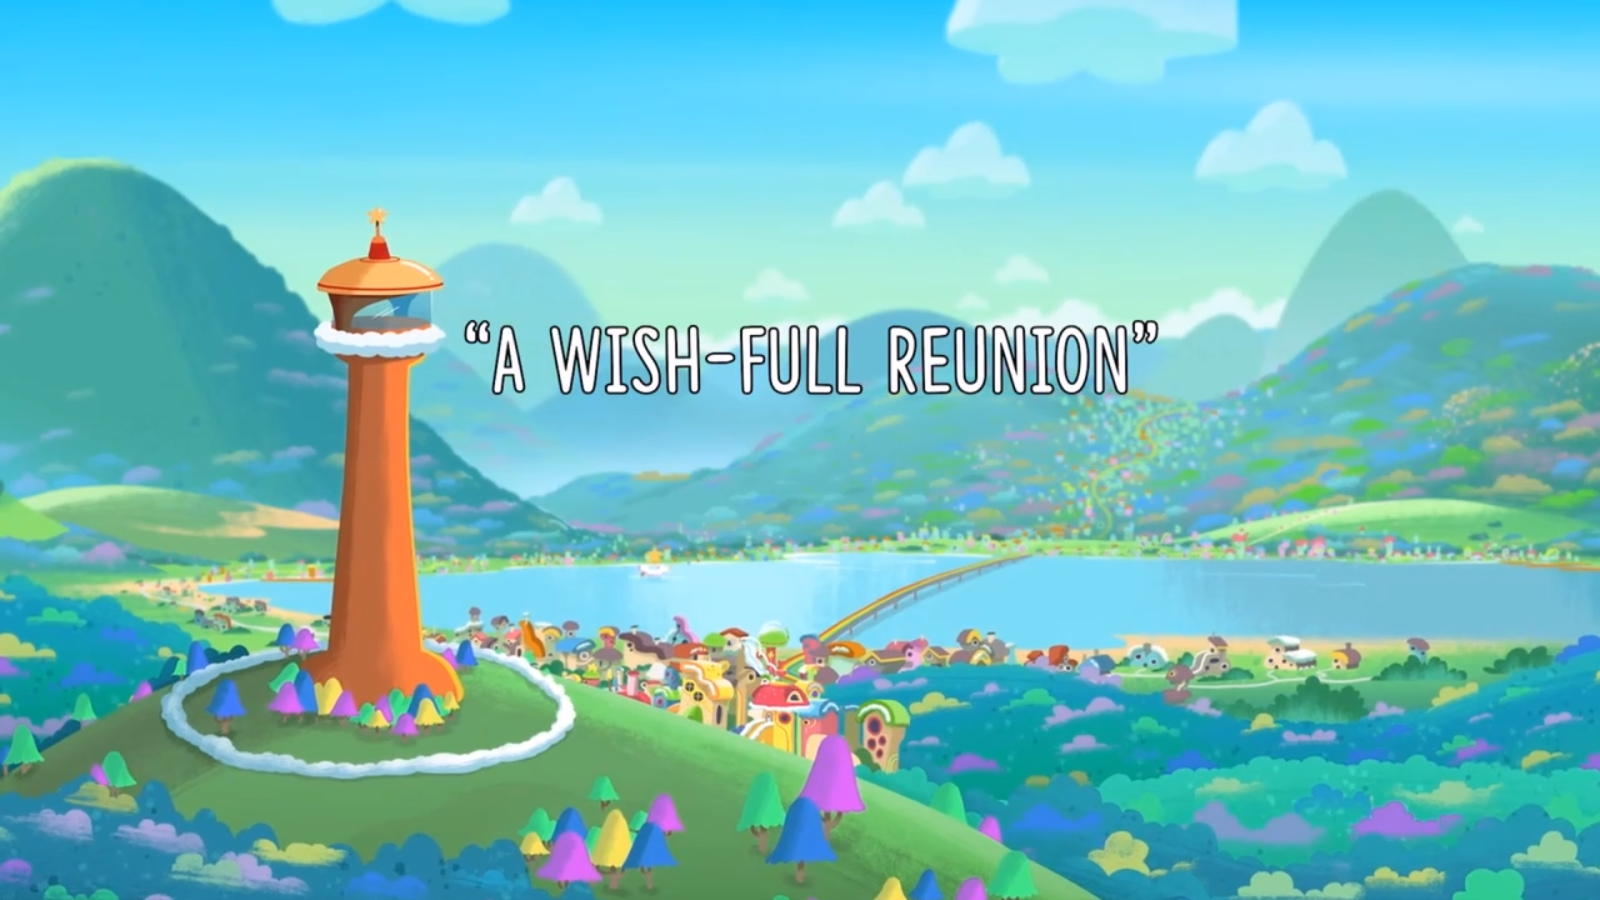 A Wish-Full Reunion